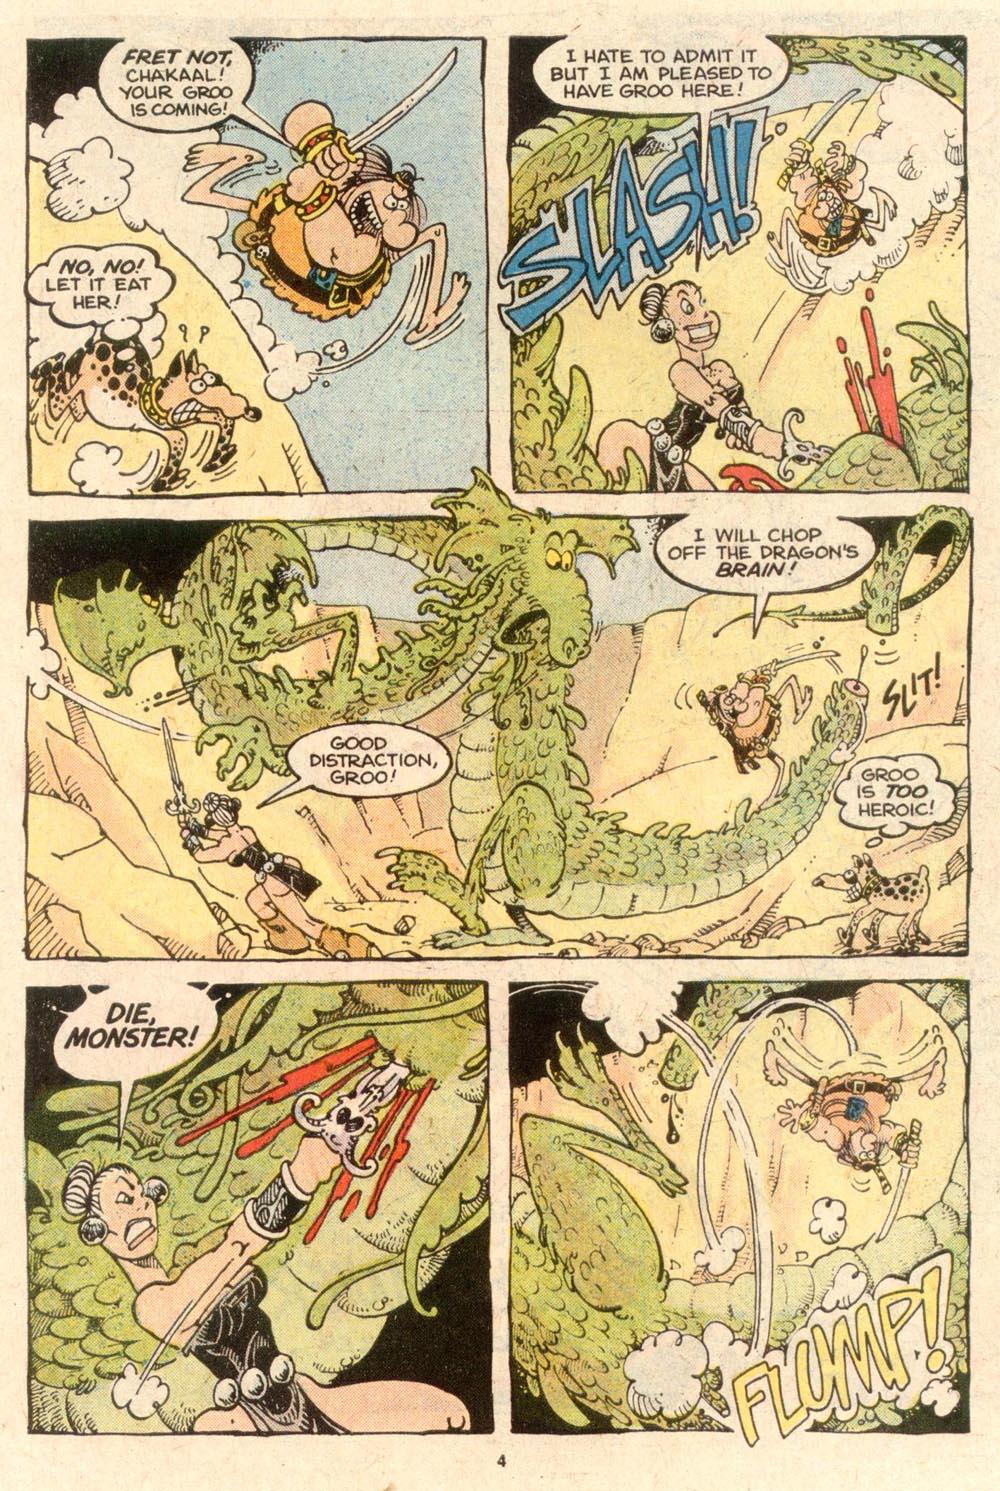 Read online Sergio Aragonés Groo the Wanderer comic -  Issue #53 - 4